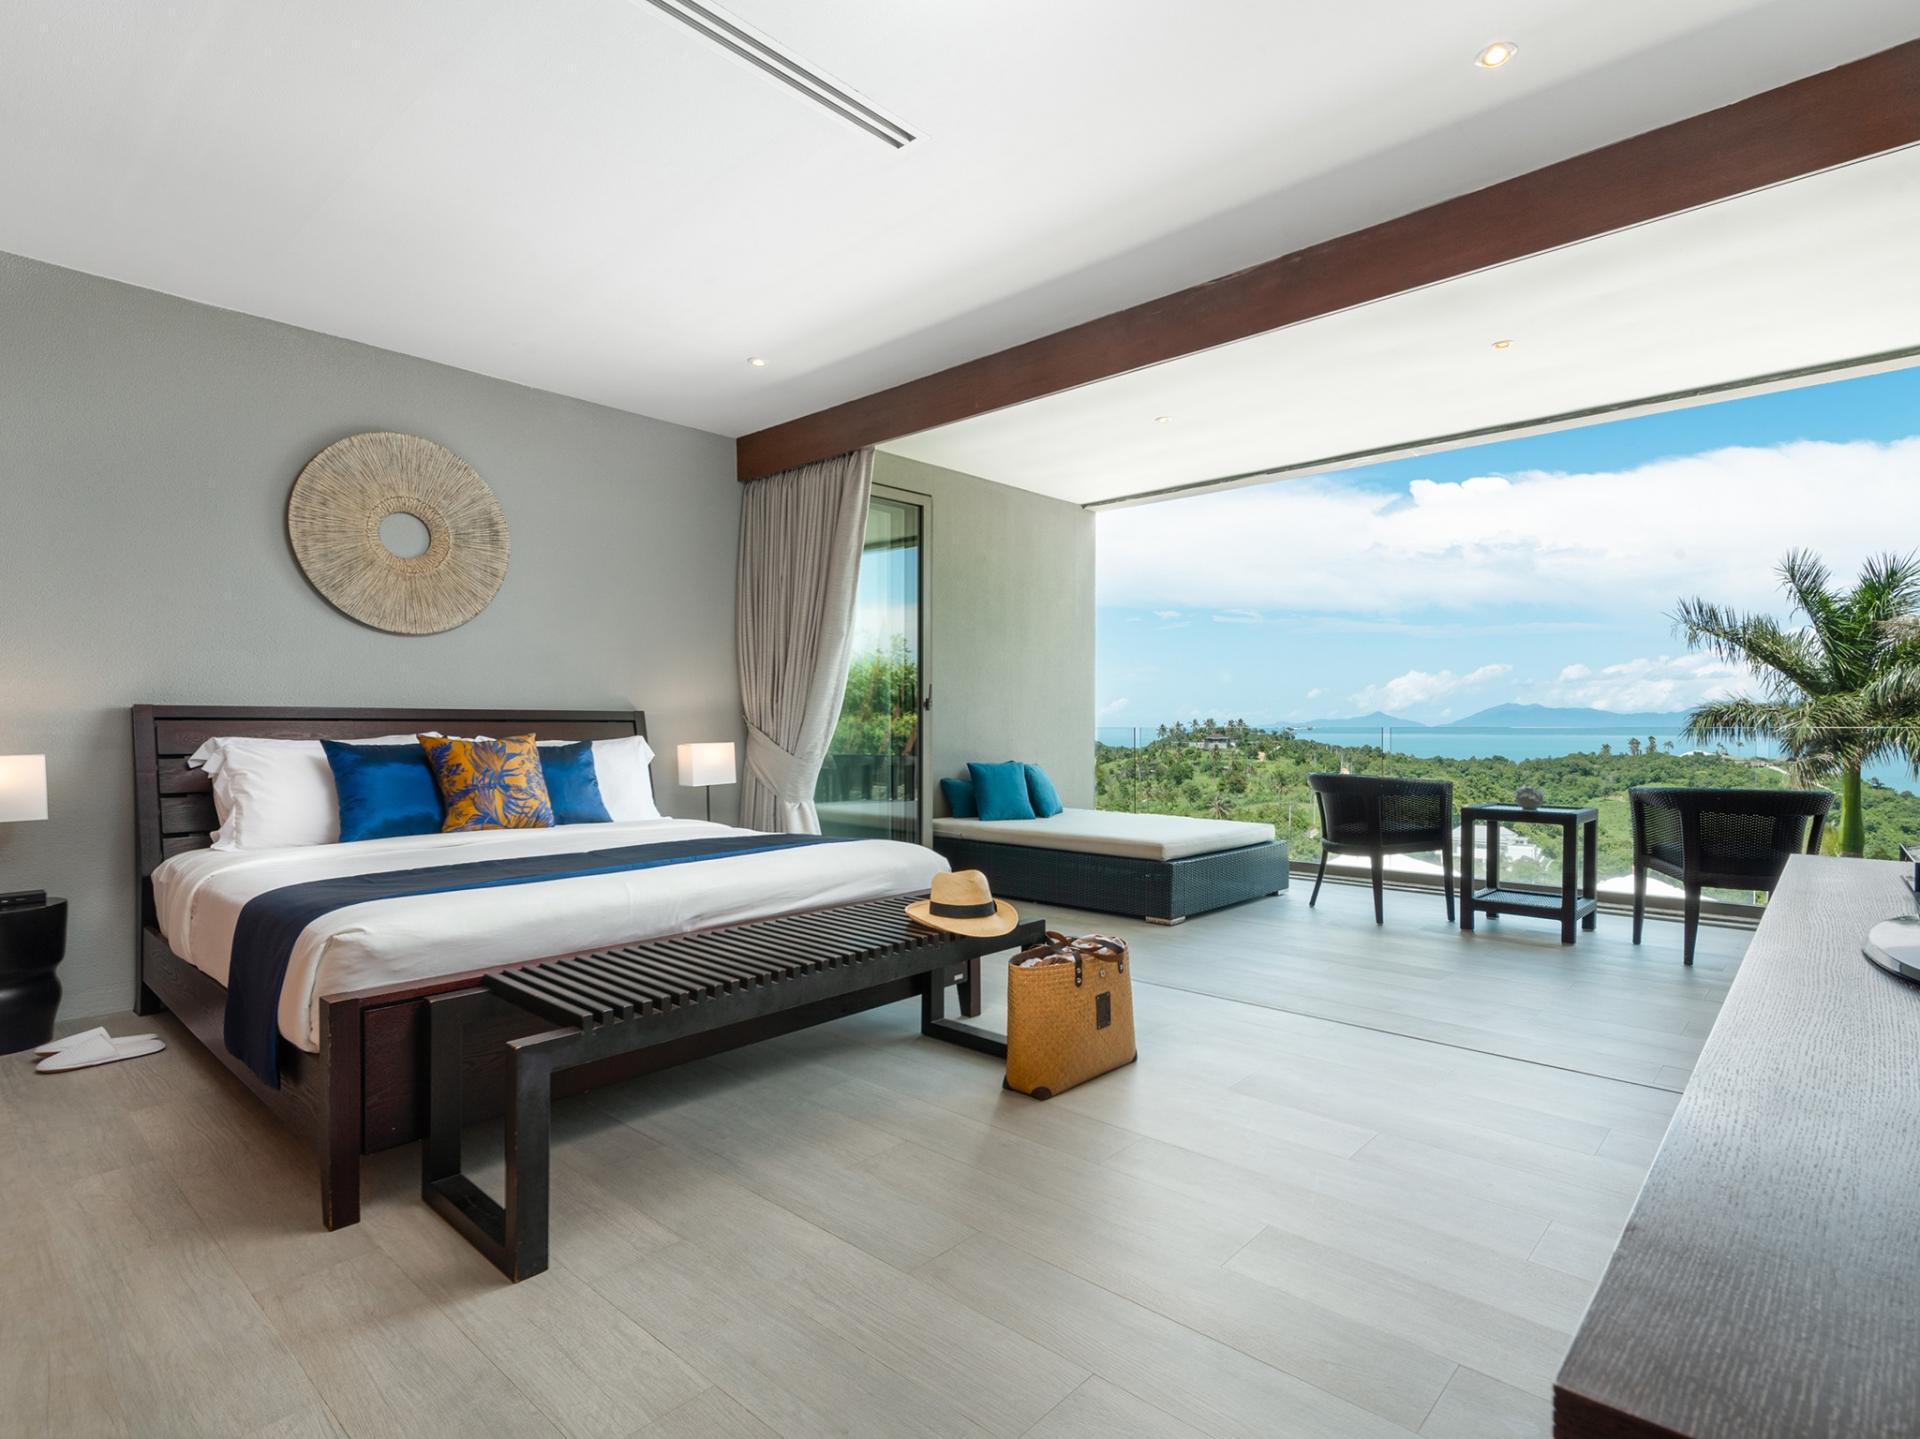 Breathtaking Family Villa-019 Villa Suralai - Deluxe bedroom with stunning views.jpg